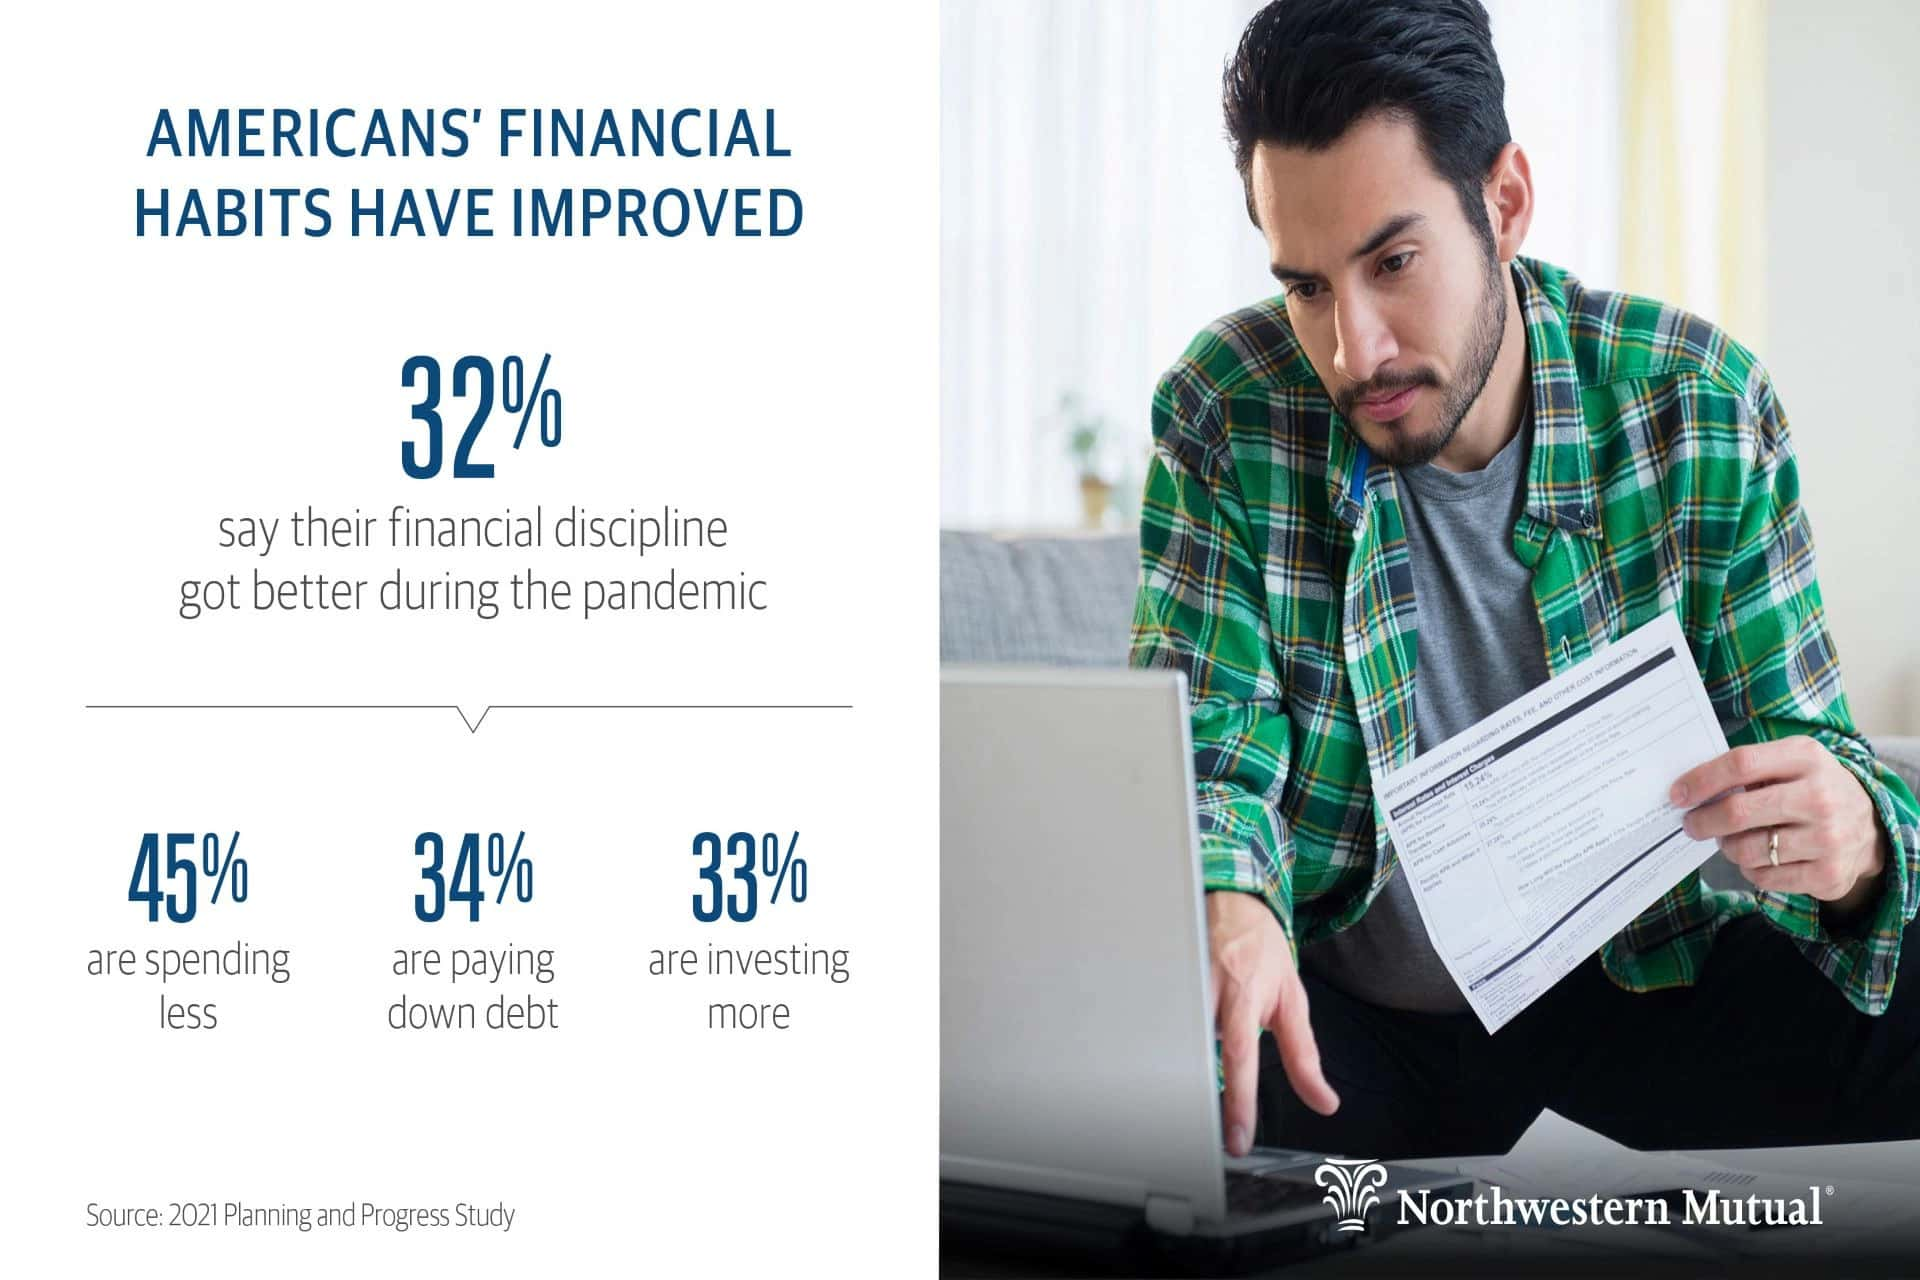 northwestern mutual shows declining debt